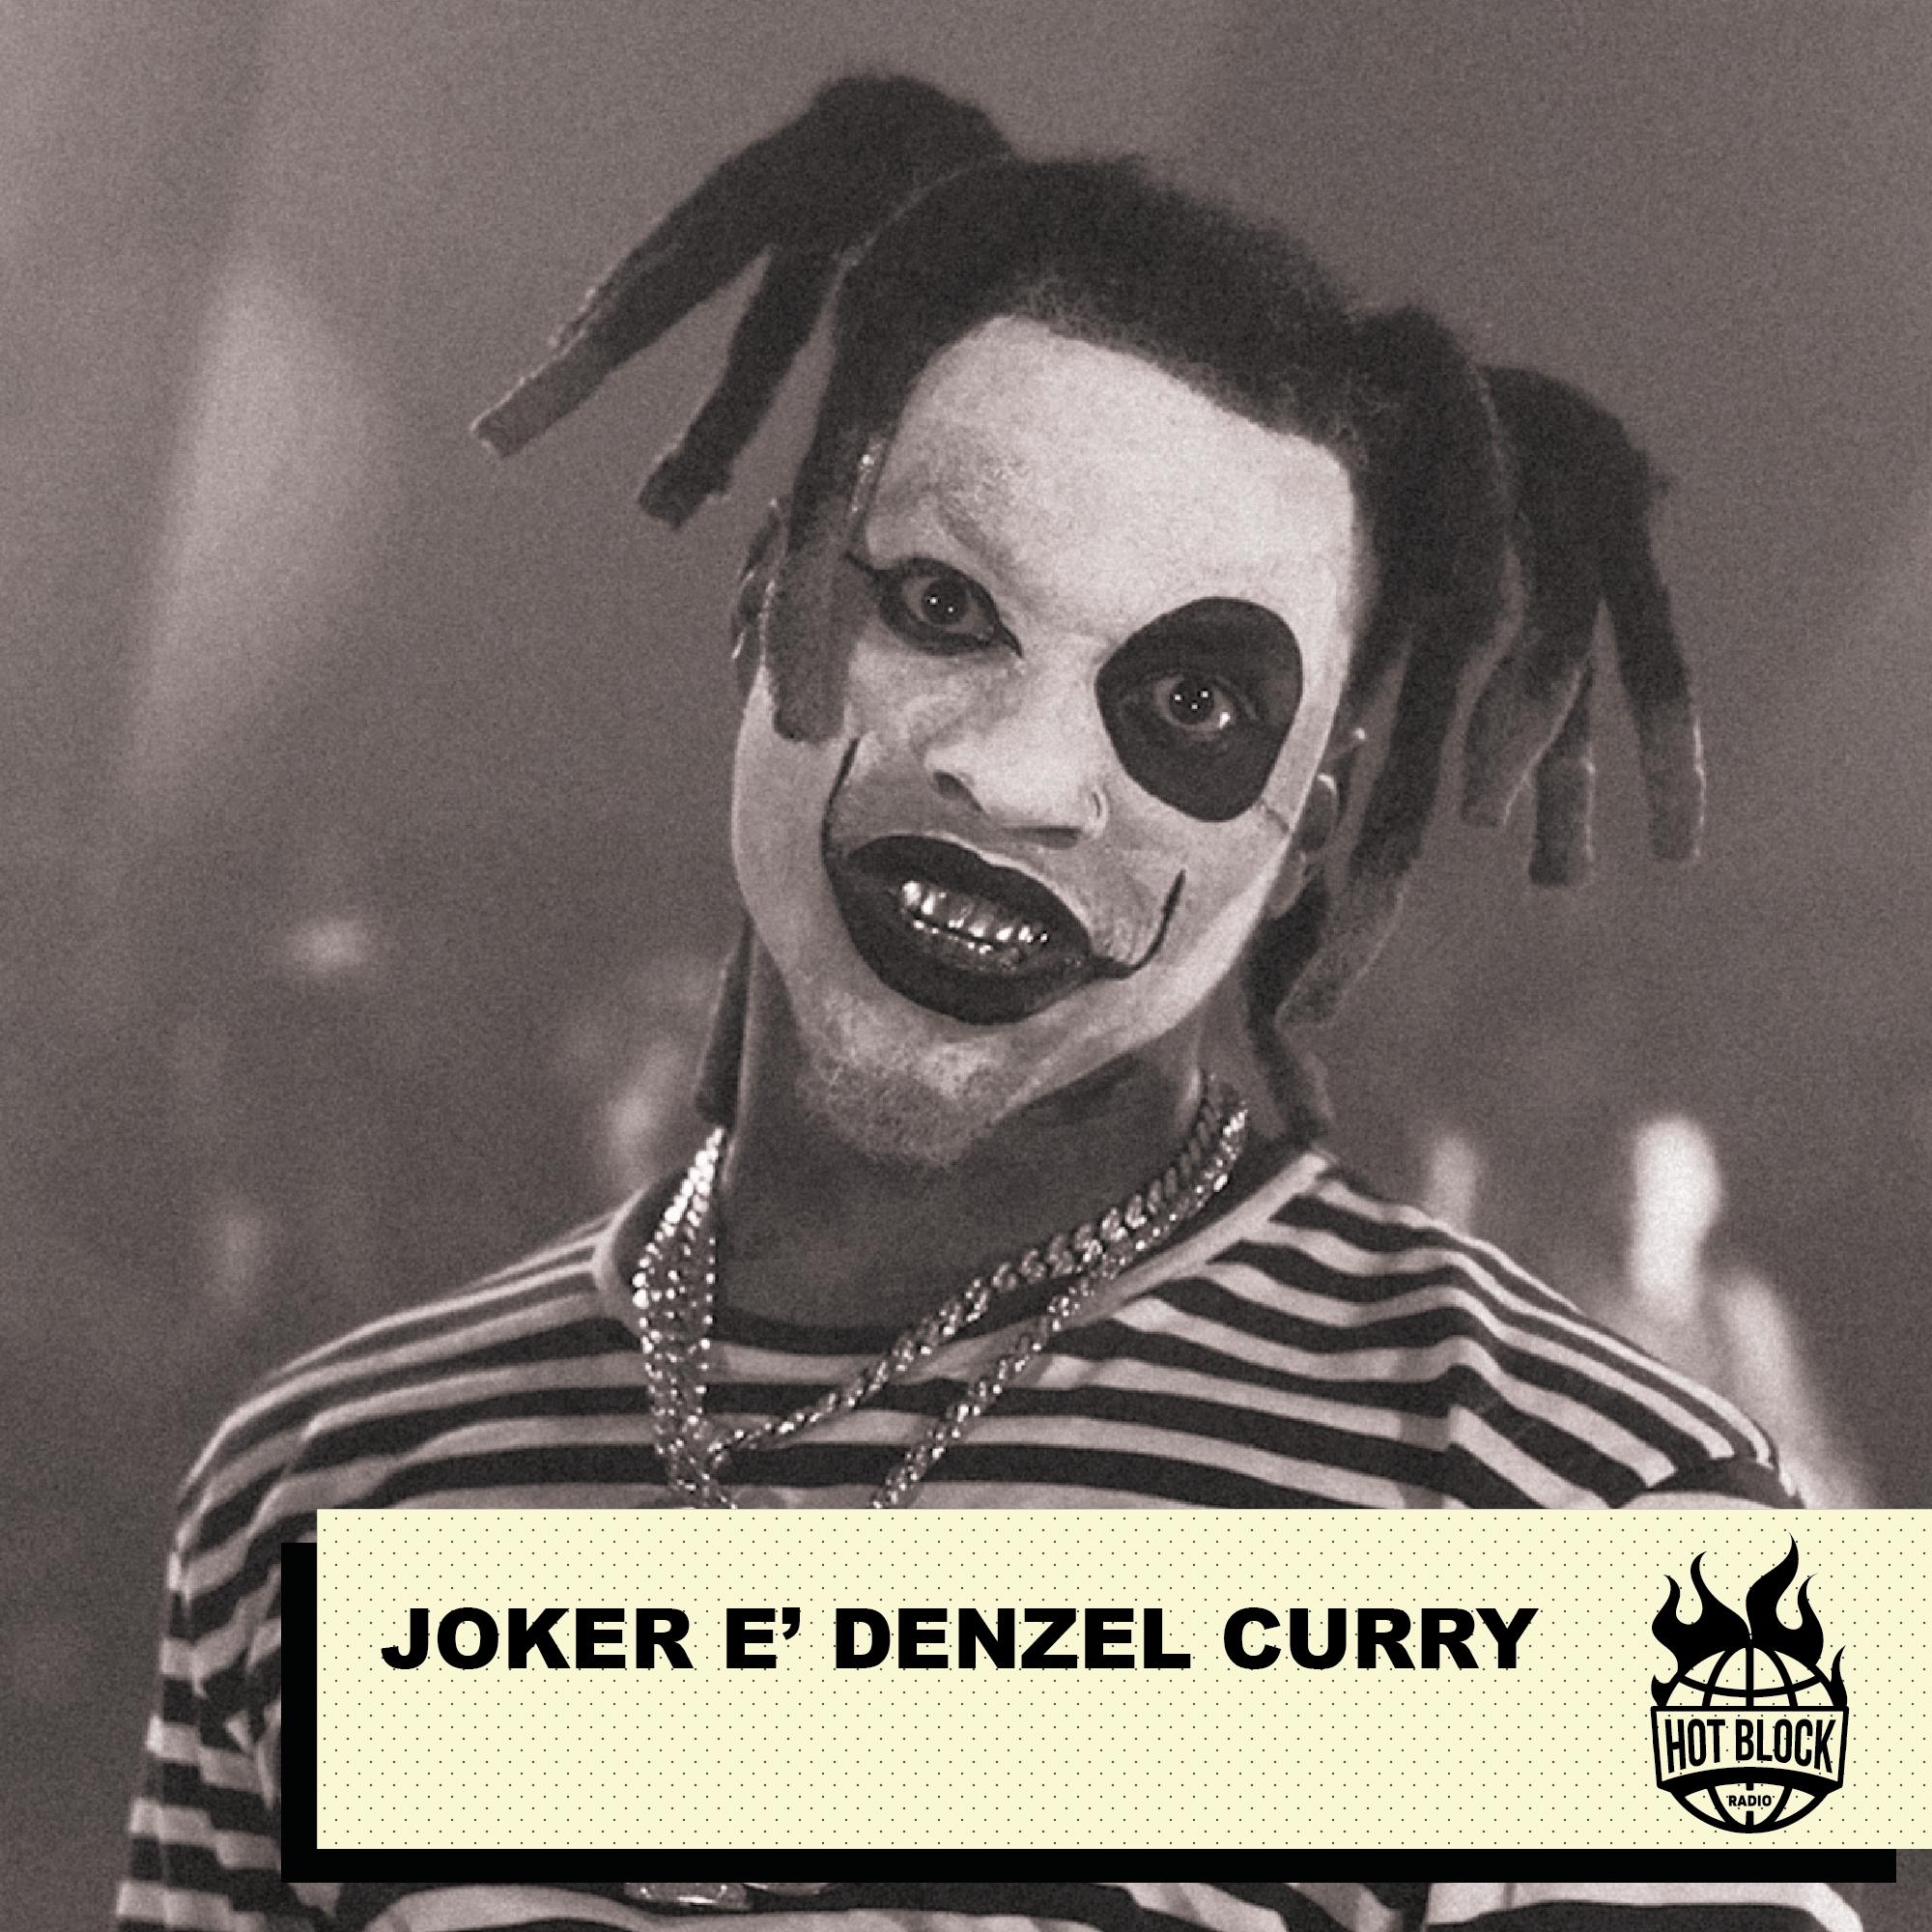 l-vero-joker-è-denzel-curry